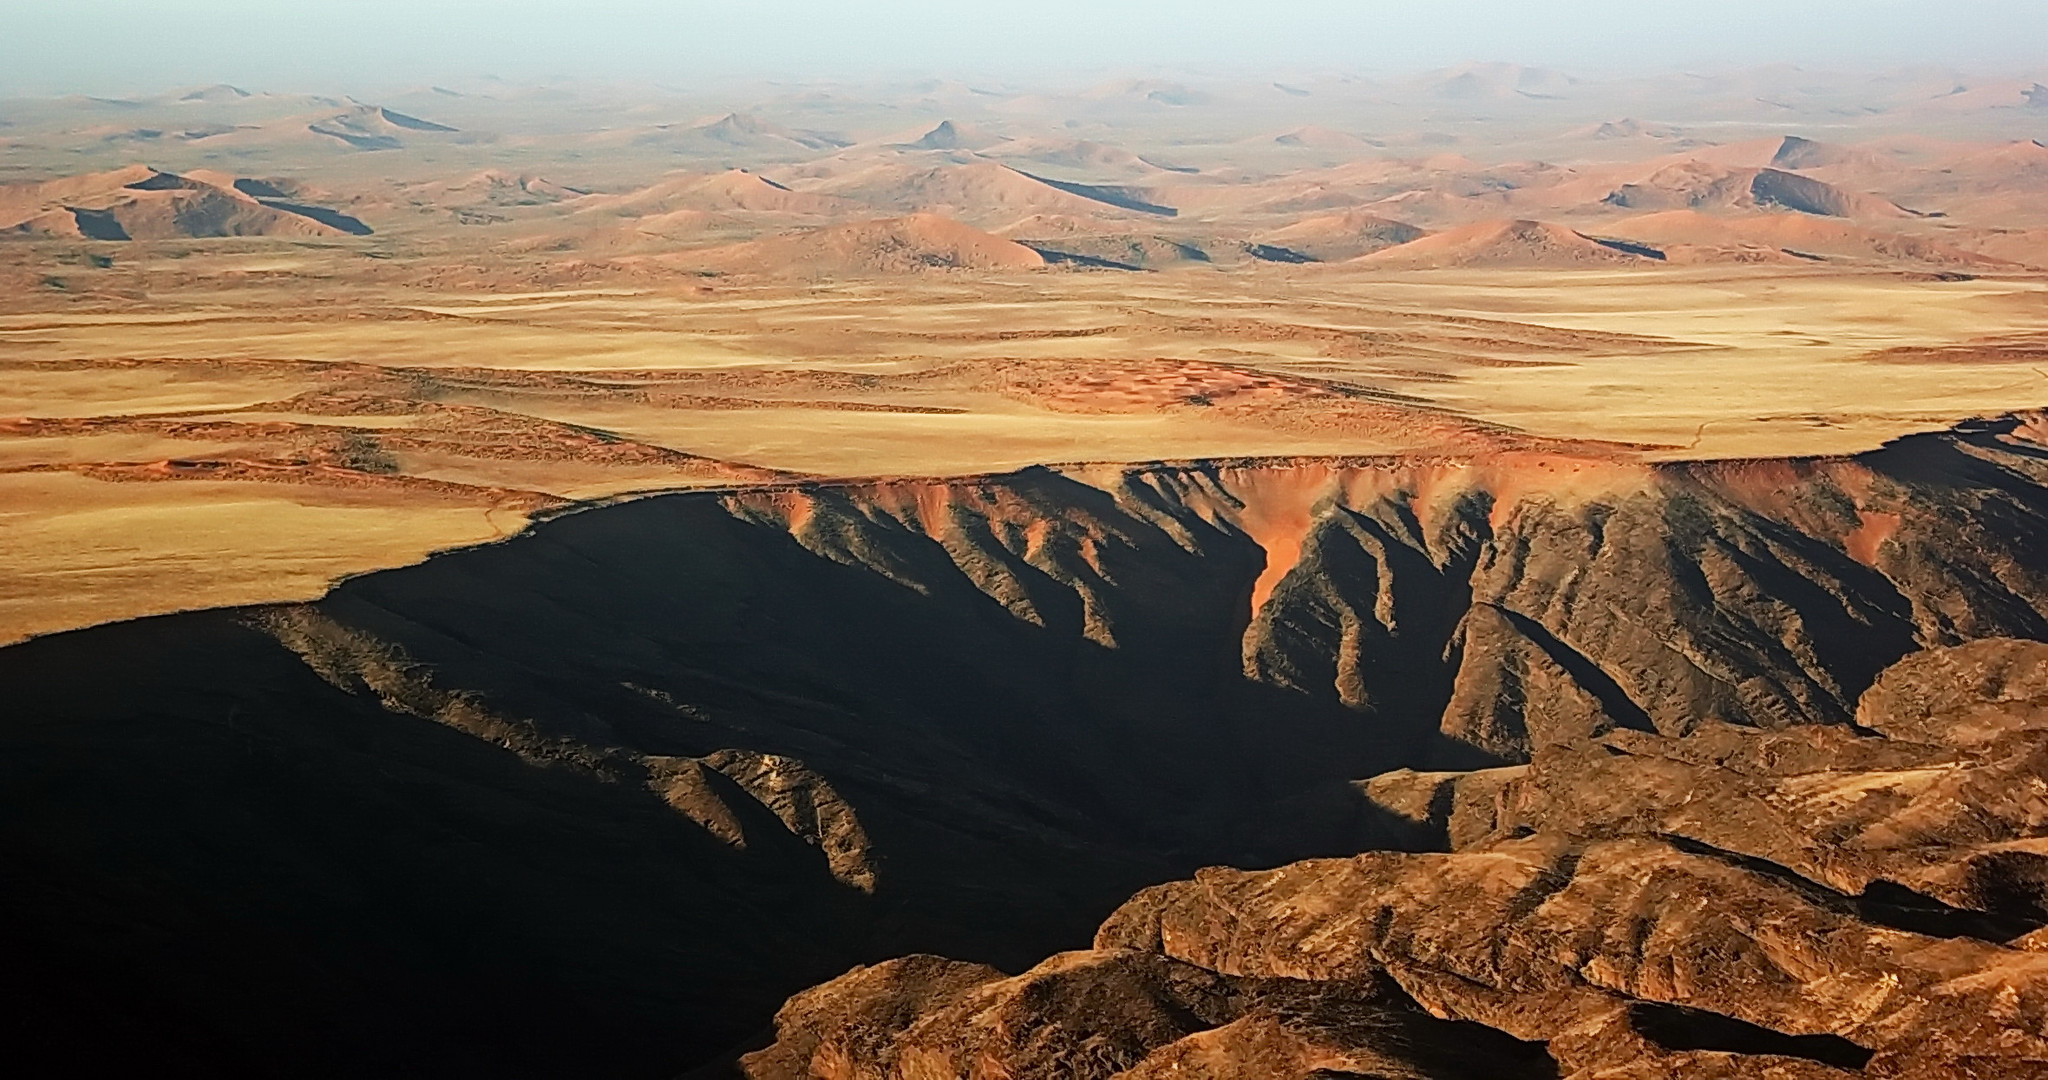 Südlich des Kuiseb-Canyon